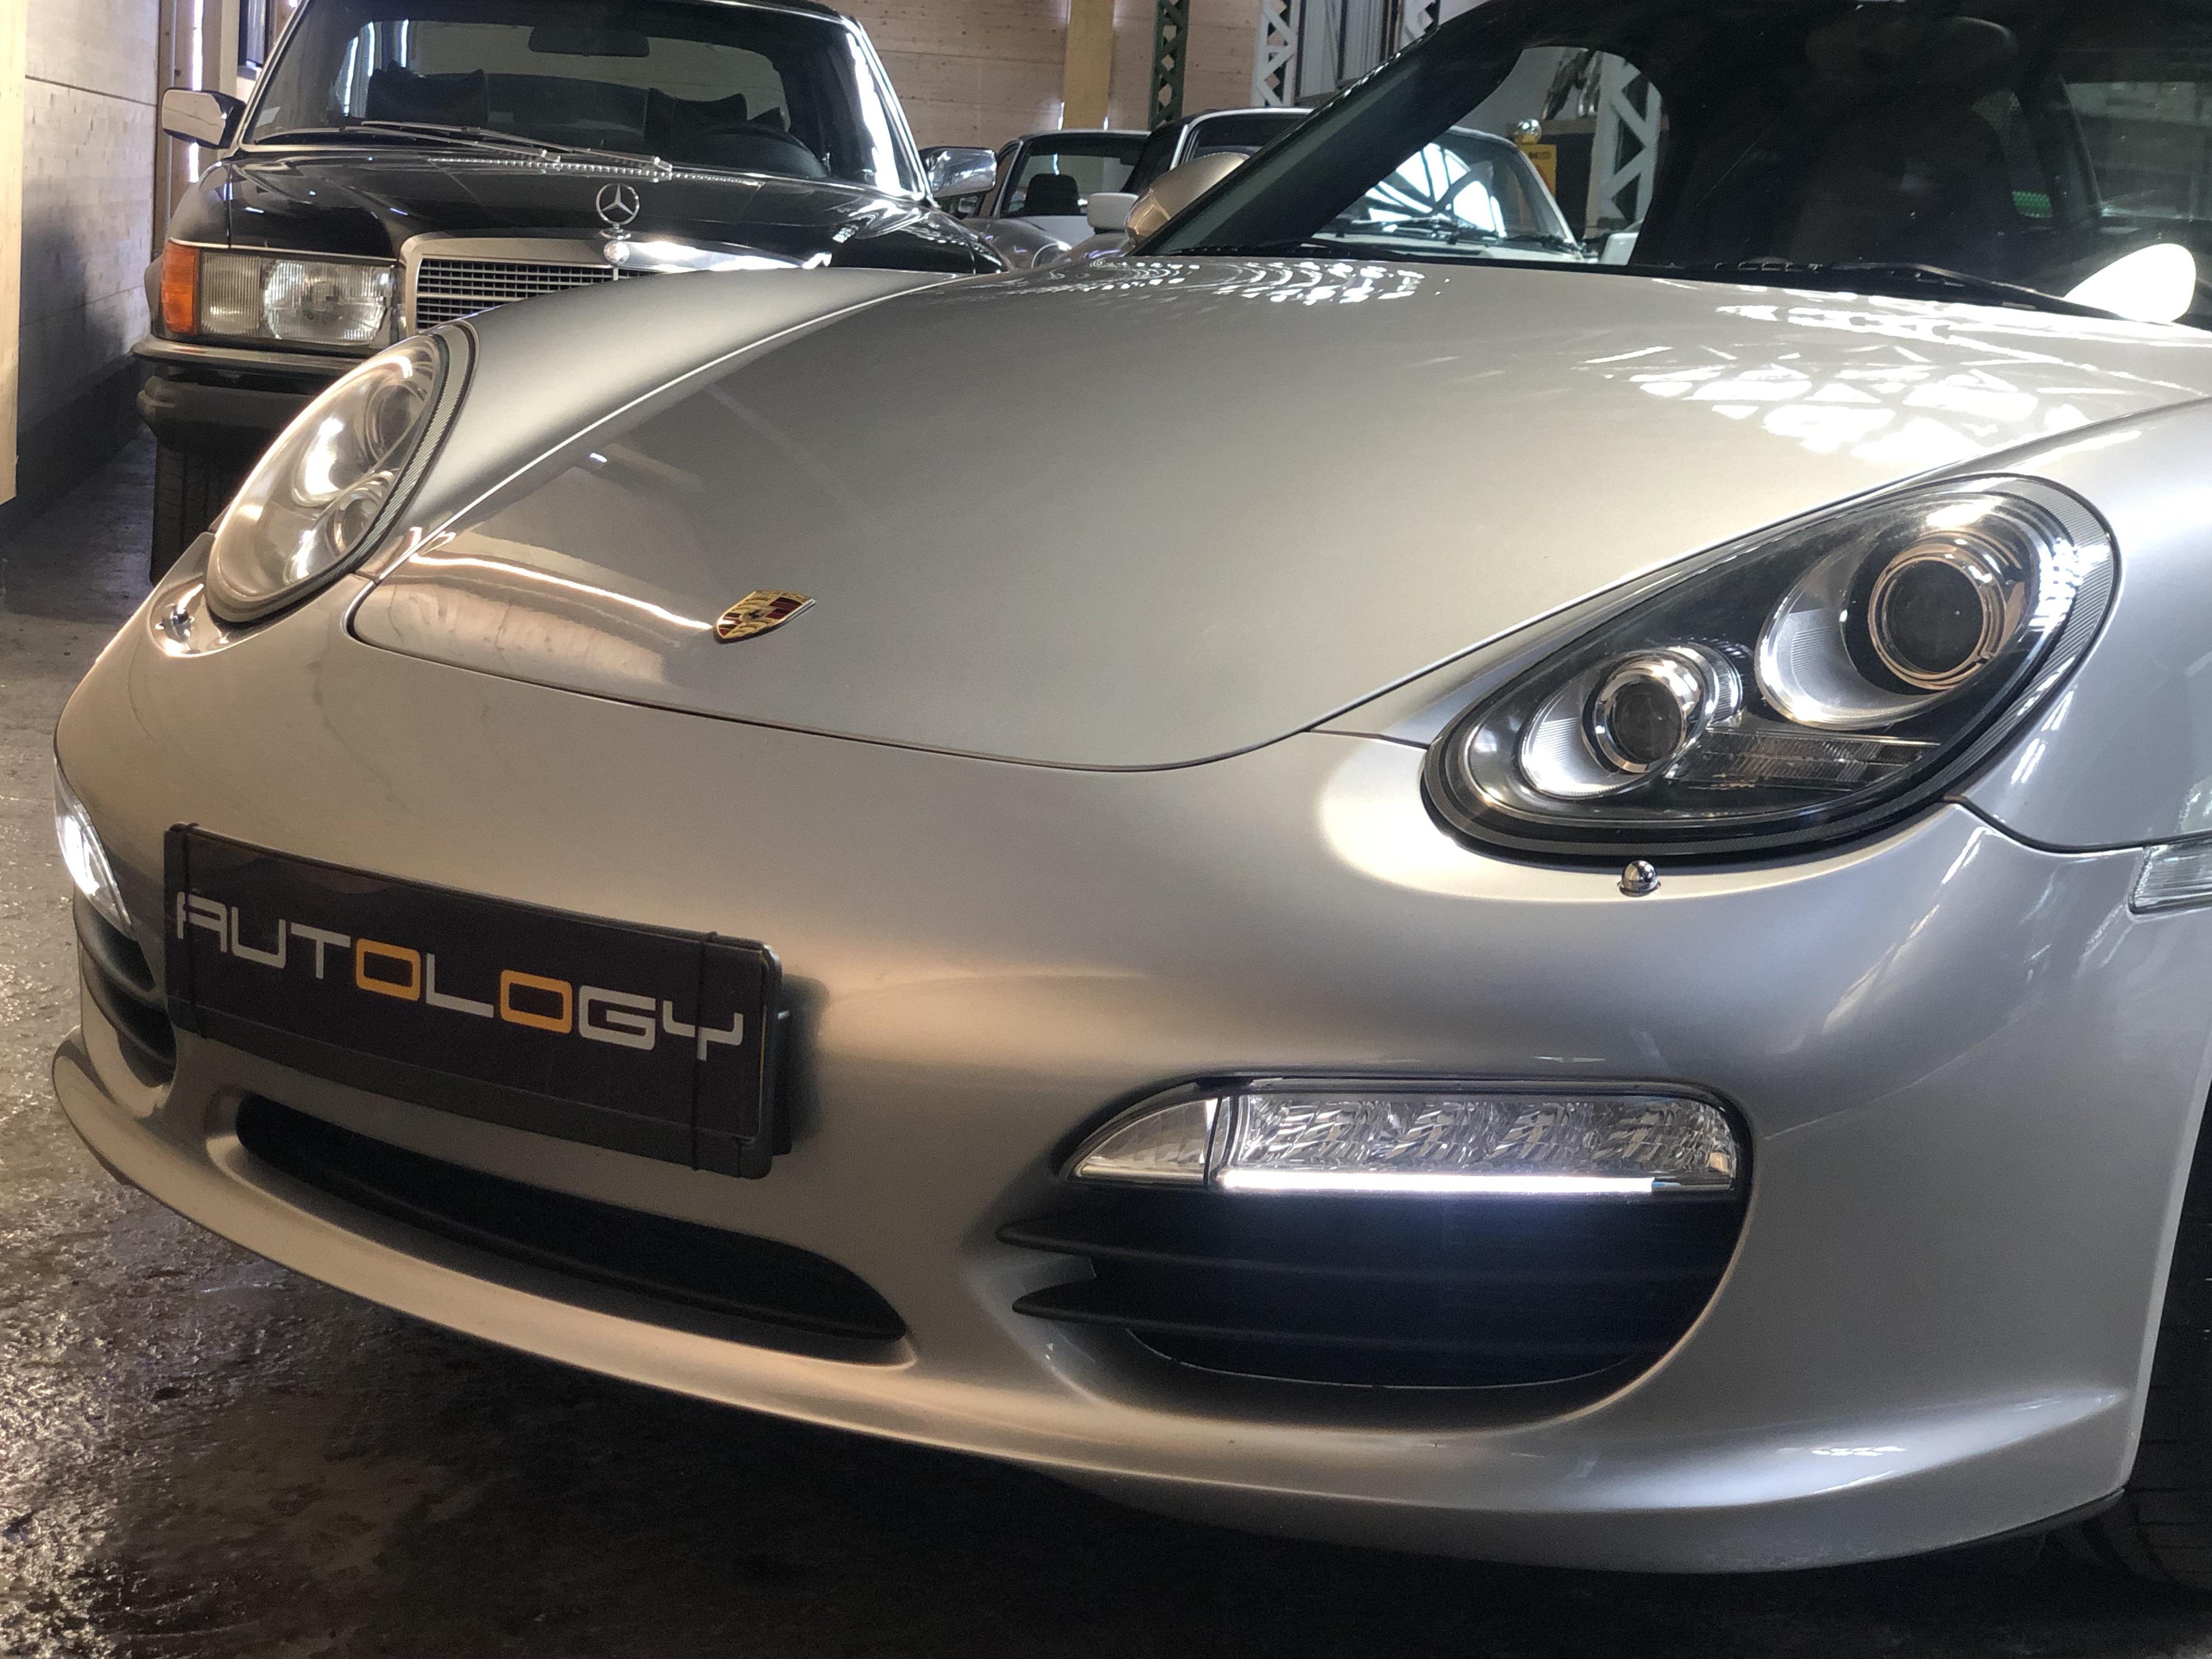 Porsche Boxster S PDK